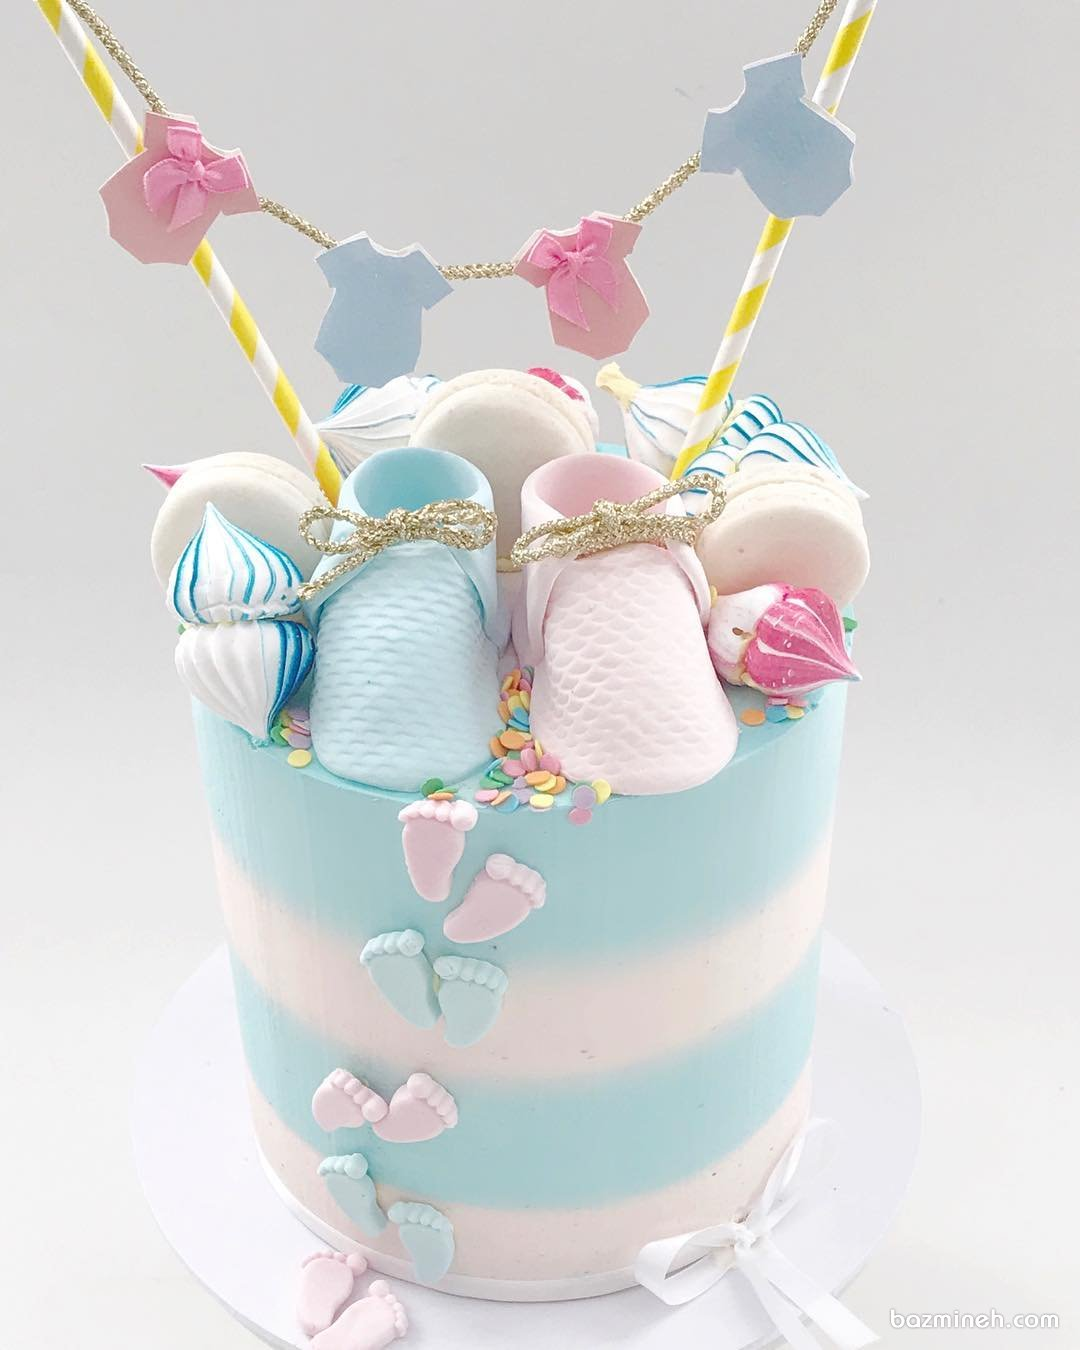 کیک فانتزی جشن بیبی شاور یا تعیین جنسیت با تم آبی صورتی